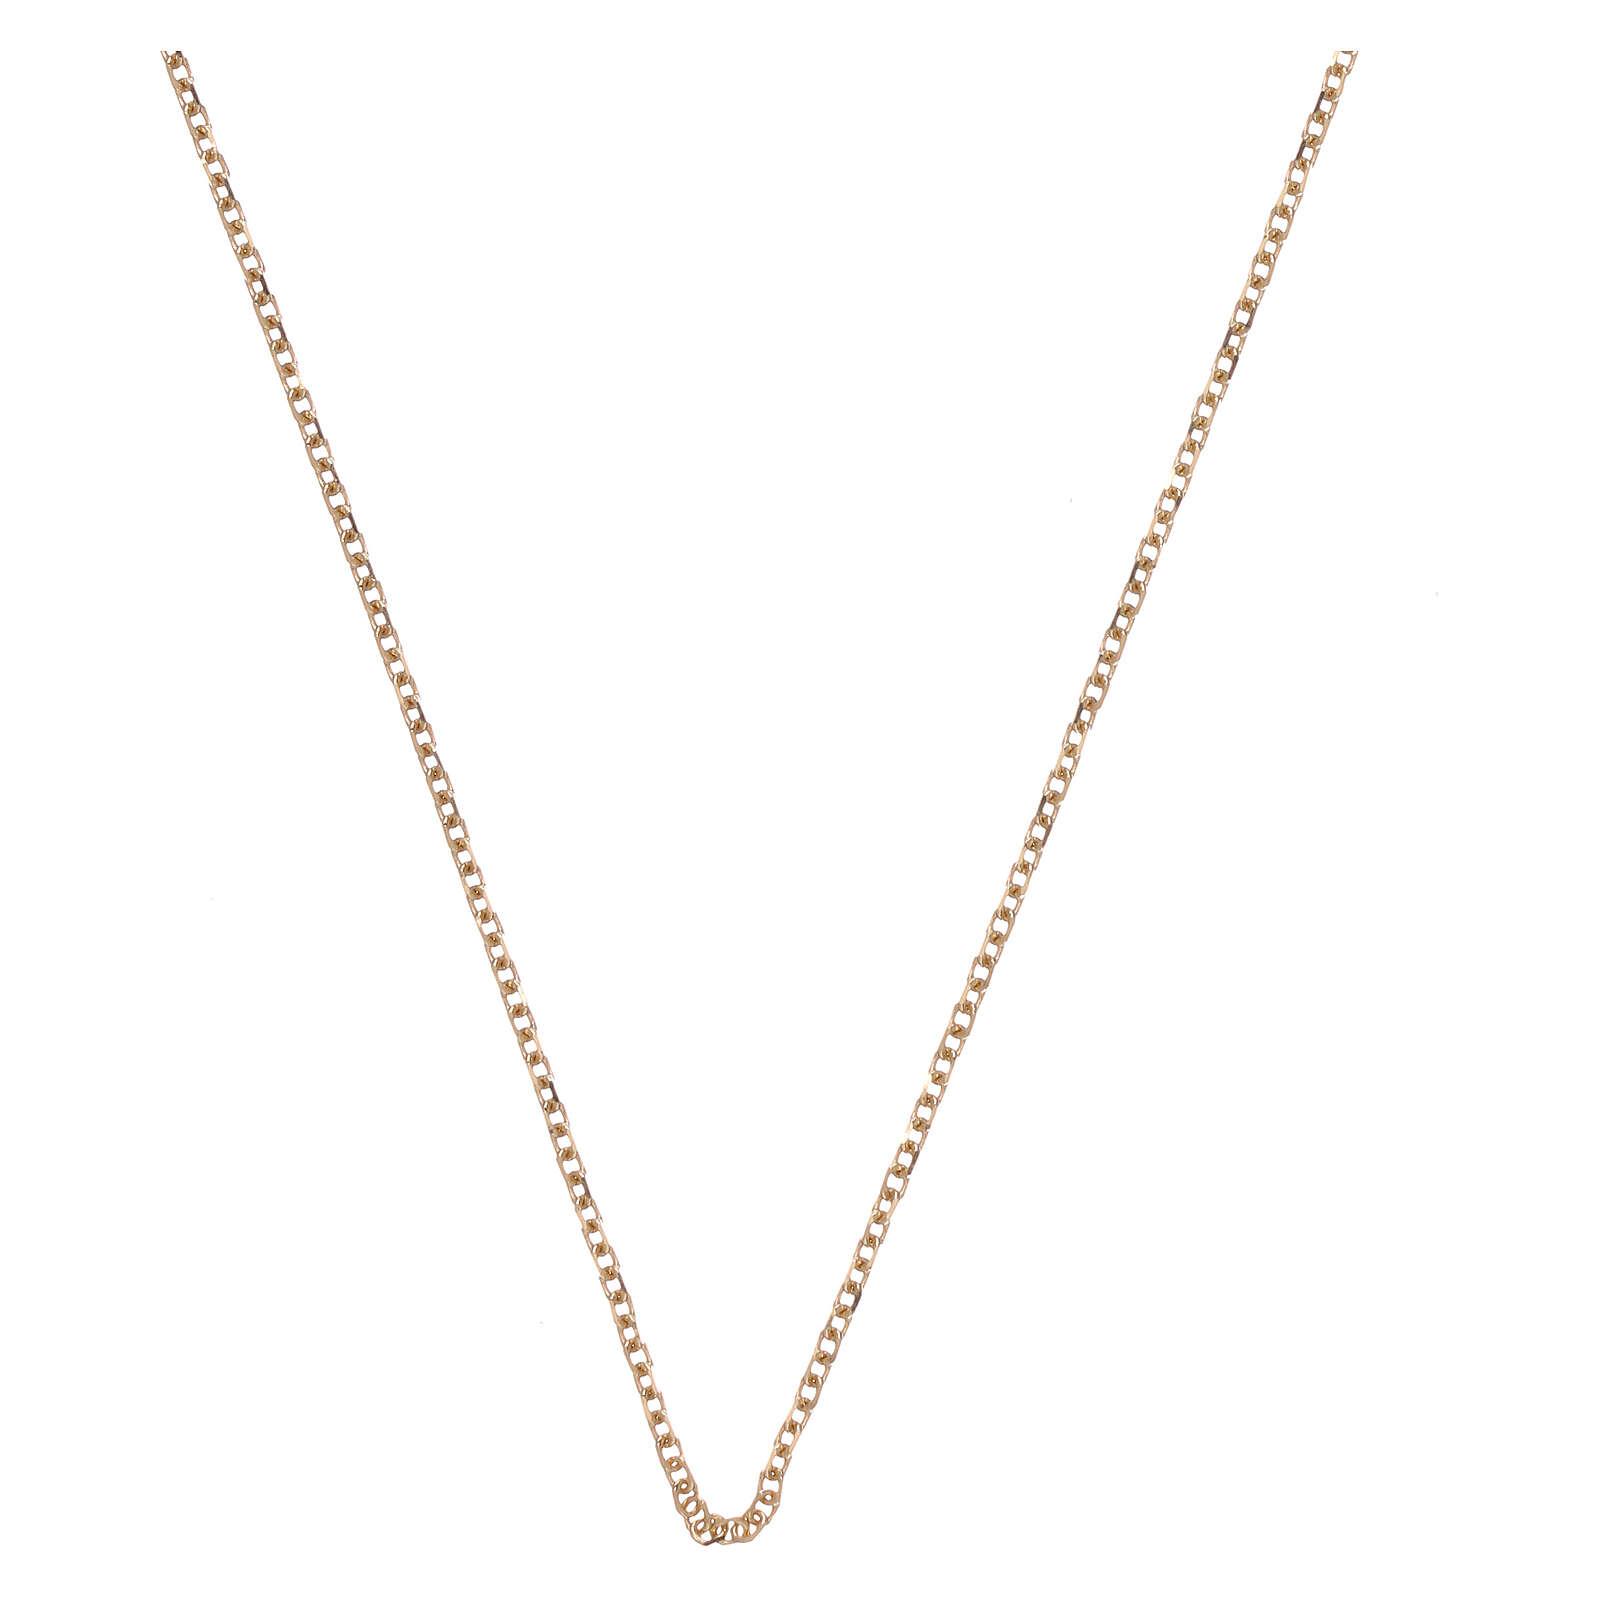 Chain, rolò diamond model, in 18K yellow gold 42 plus 3 cm 4